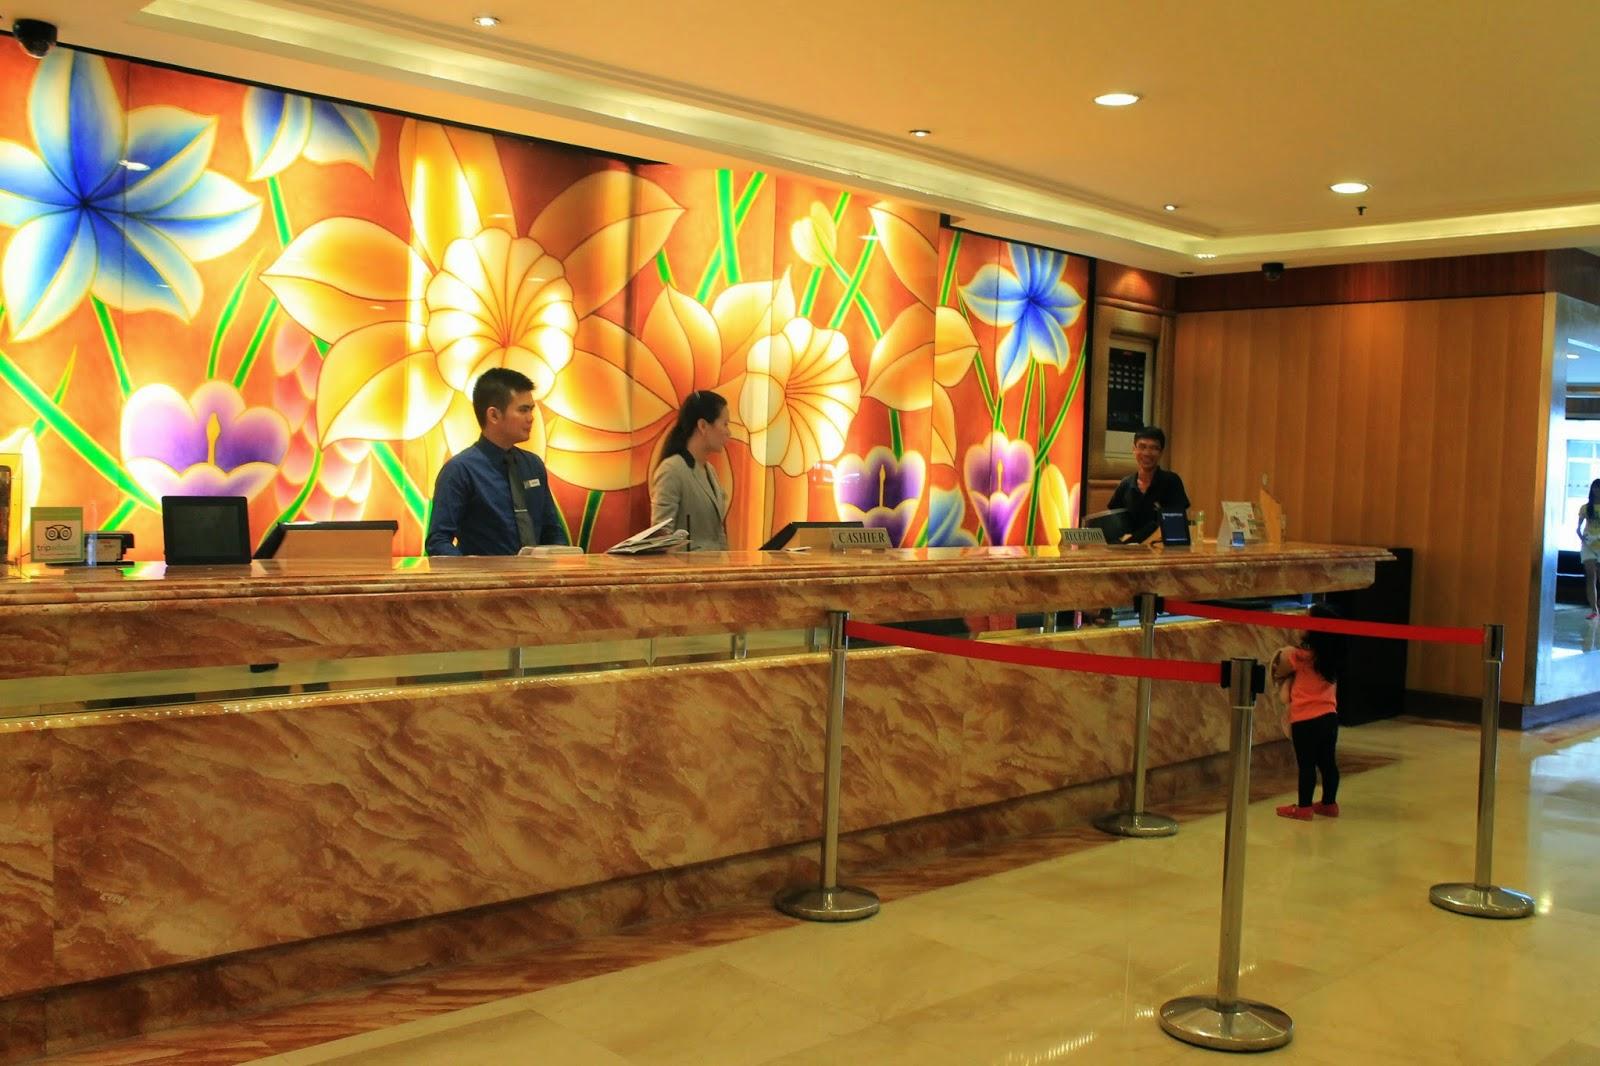 GASTRONOMY by Joy: A Closer Look at City Garden Suites Manila